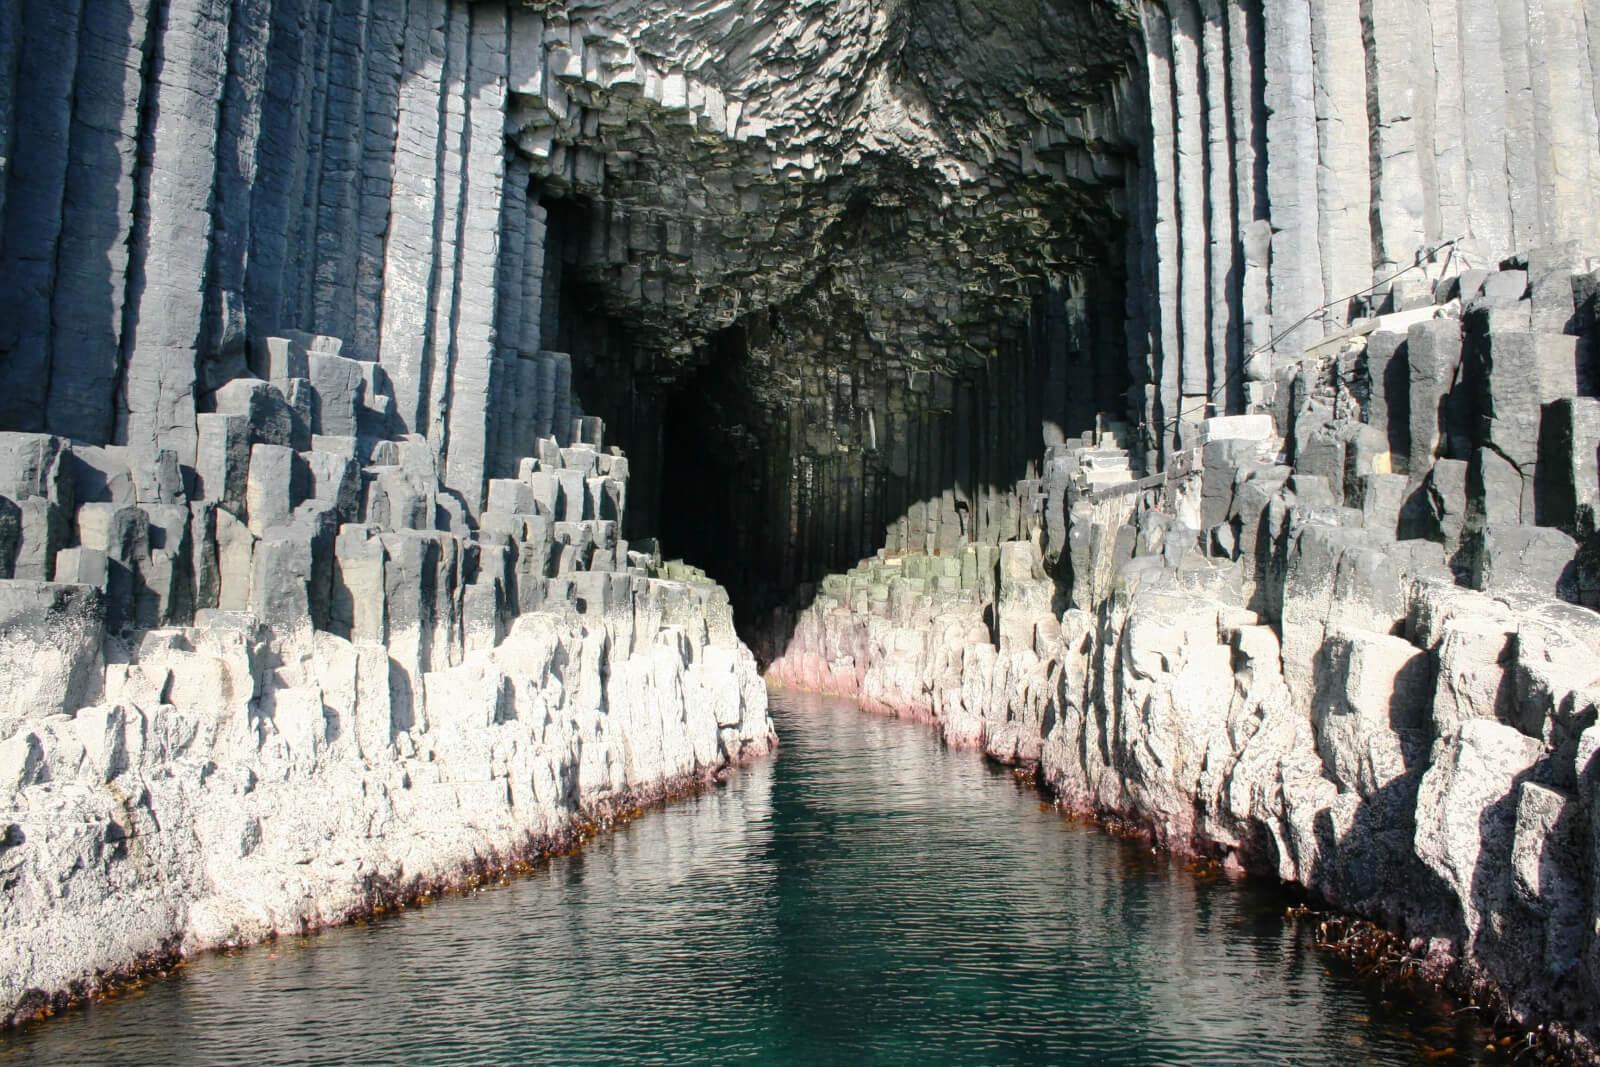 غار فینگال اسکاتلند